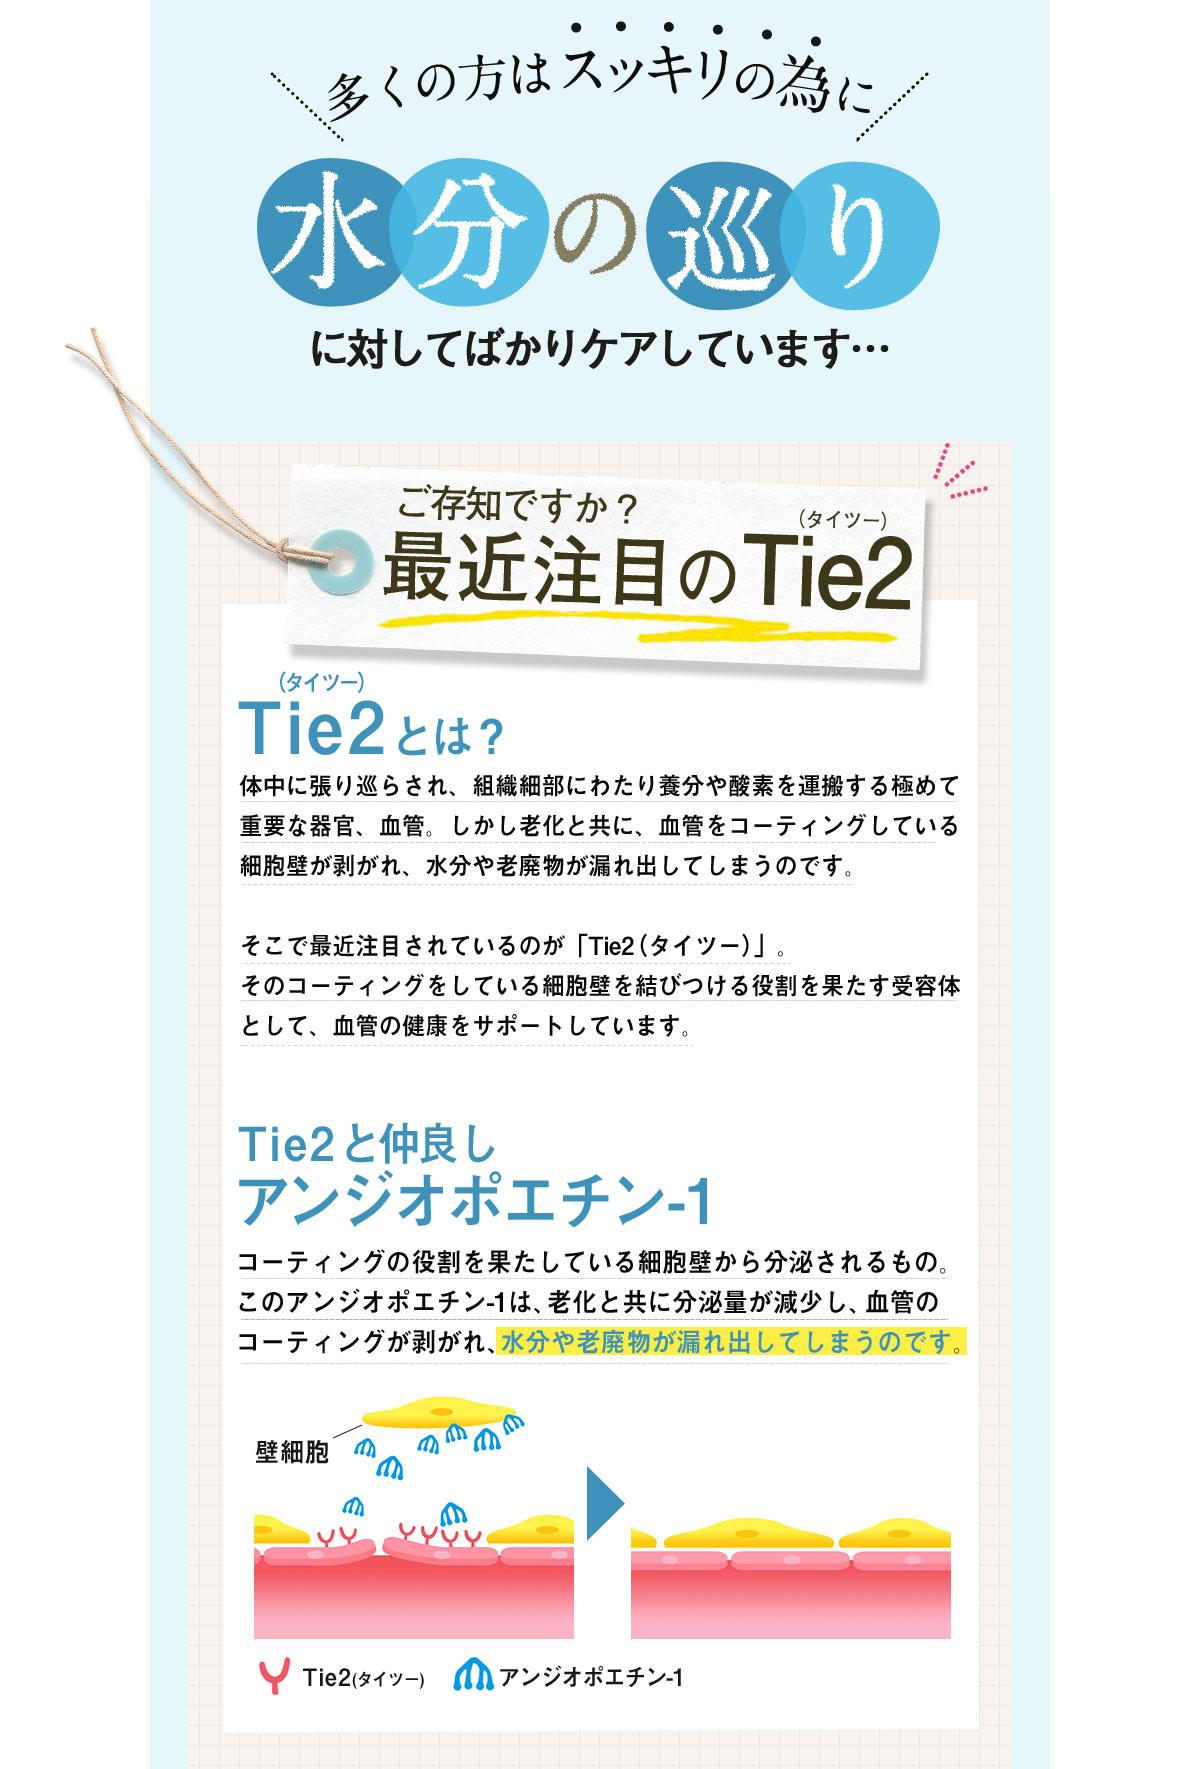 image_08.jpg